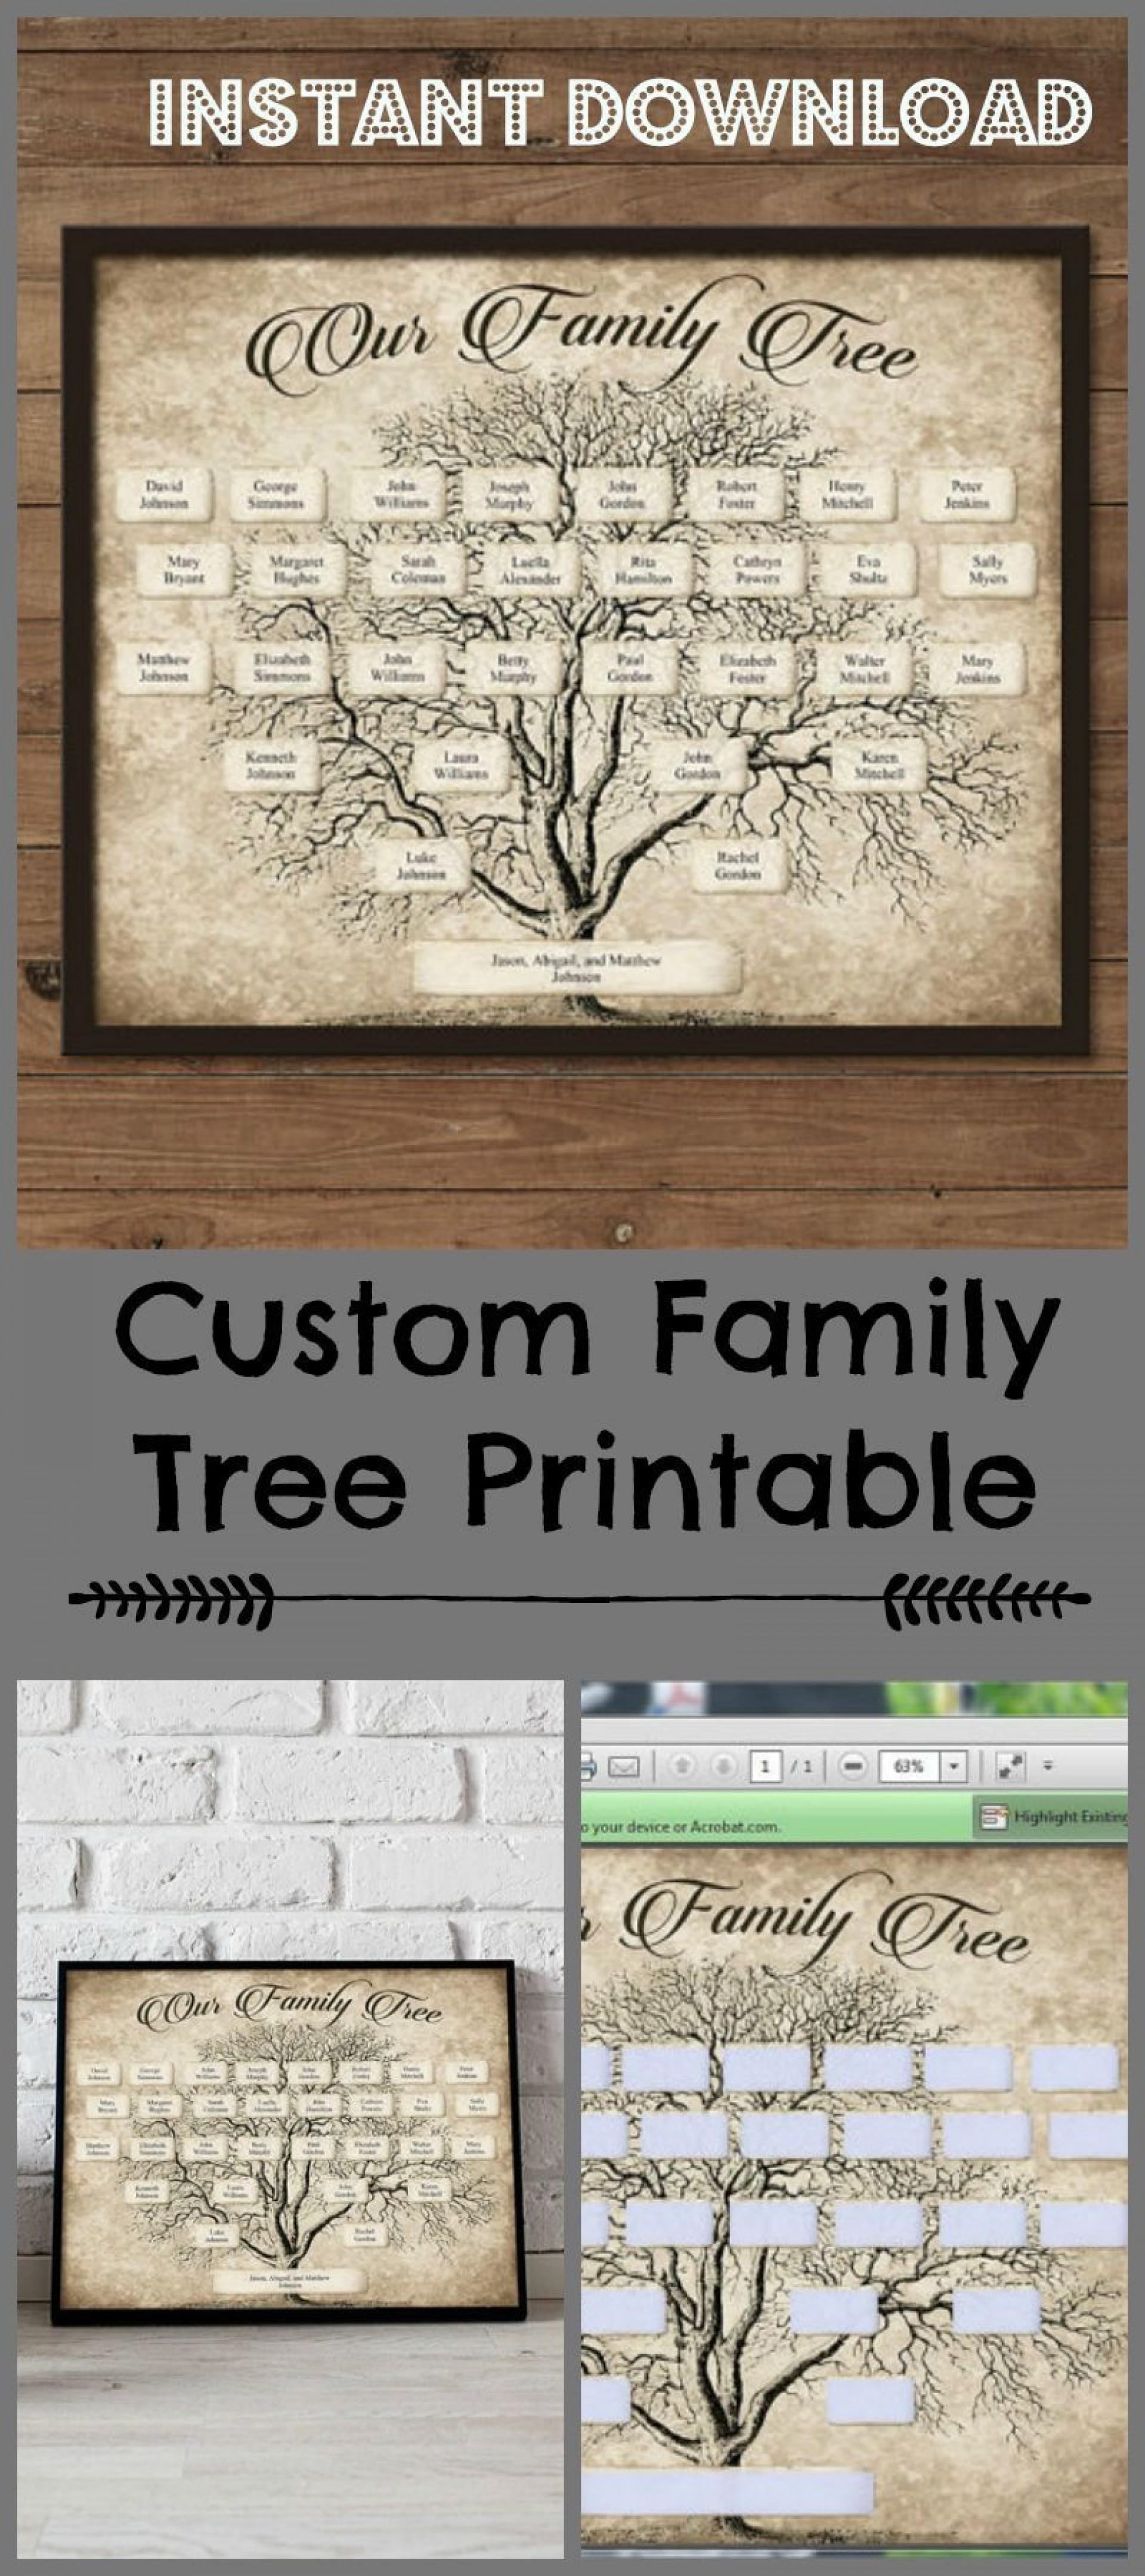 003 Stupendou Family Tree Book Template Sample  Photo Free1920